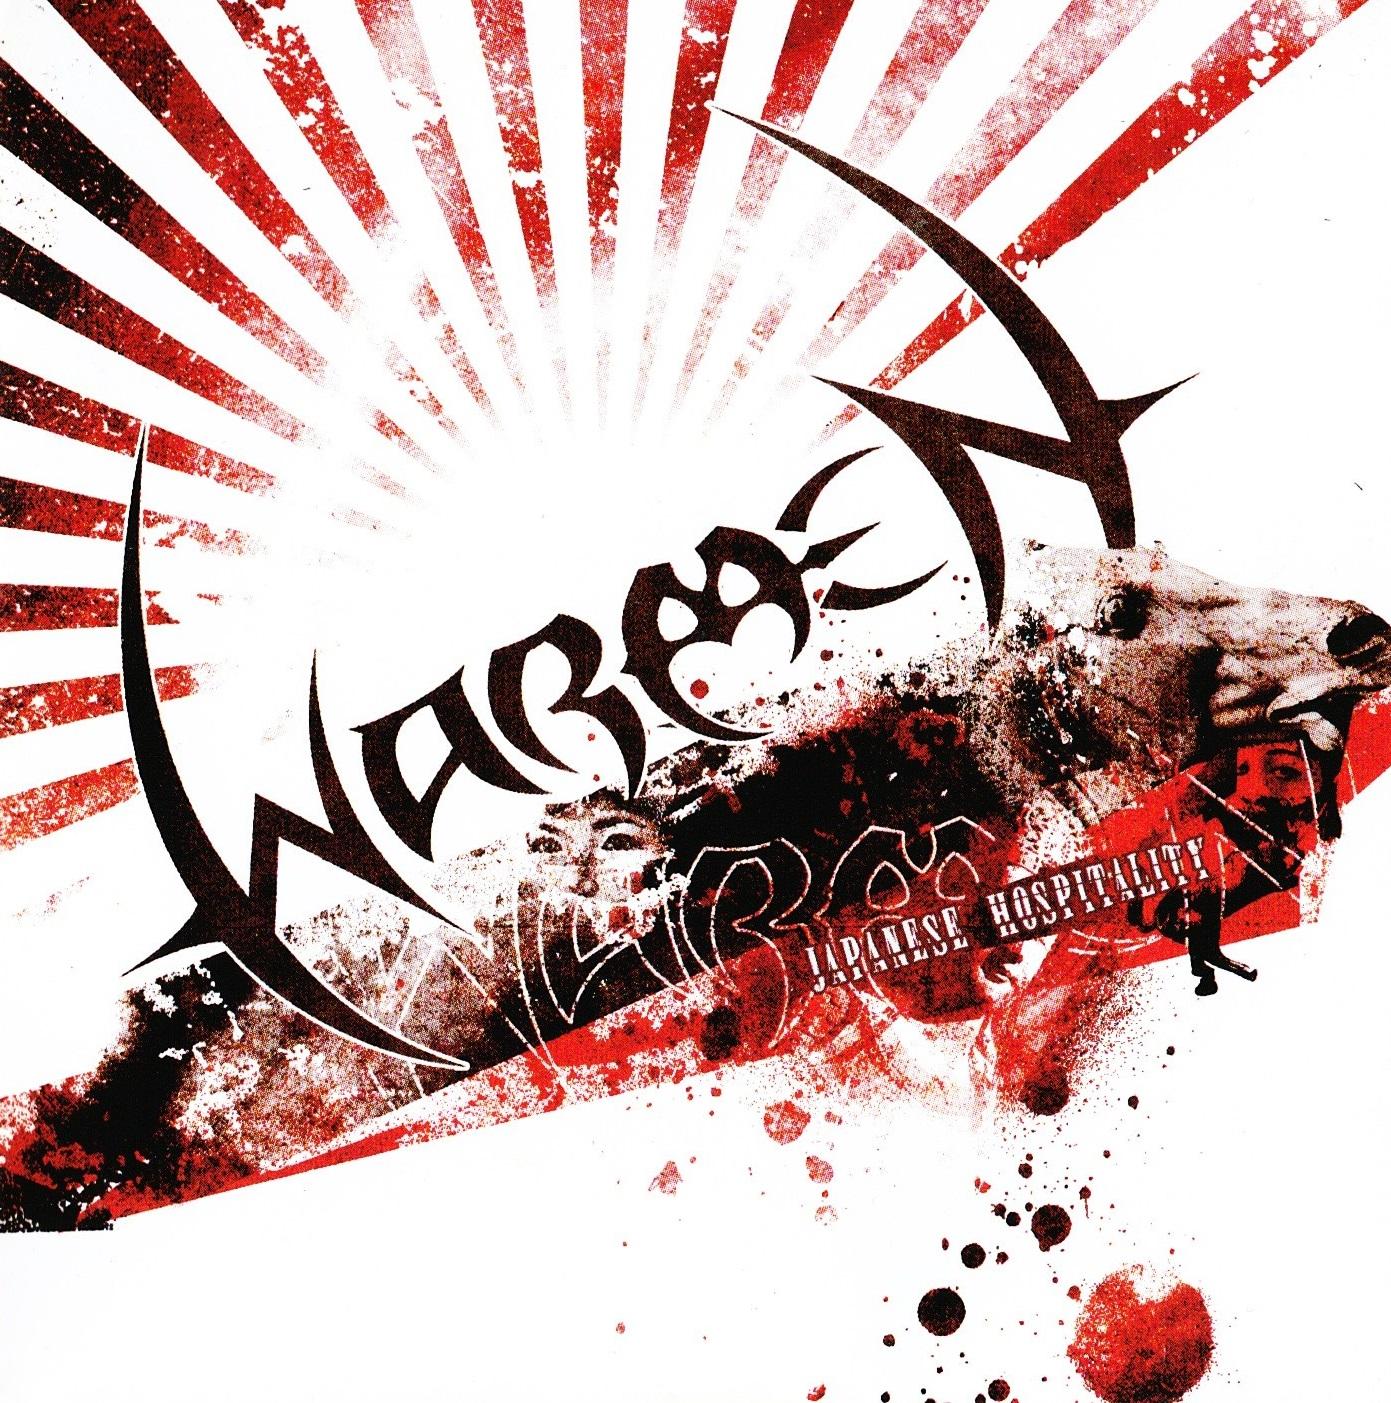 Warmen — Japanese Hospitality (2009)